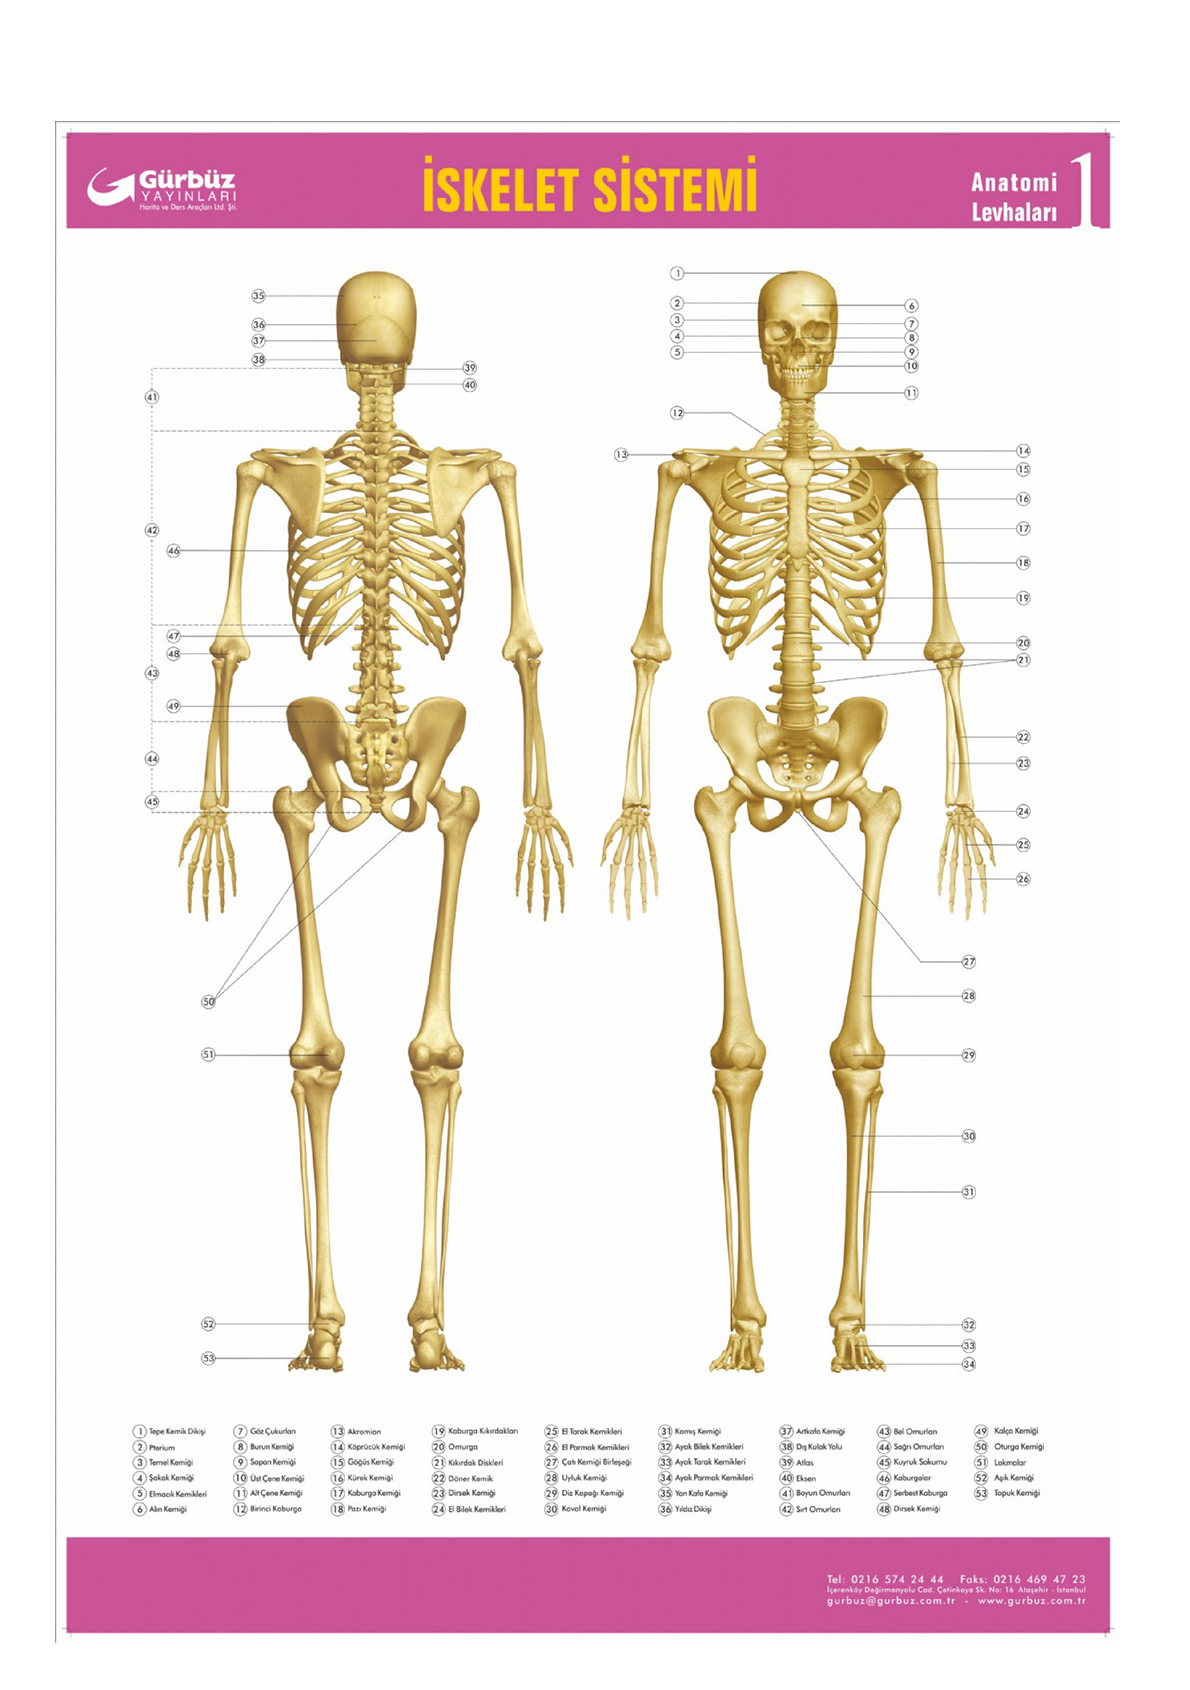 Iskelet Sistemi Levhasi